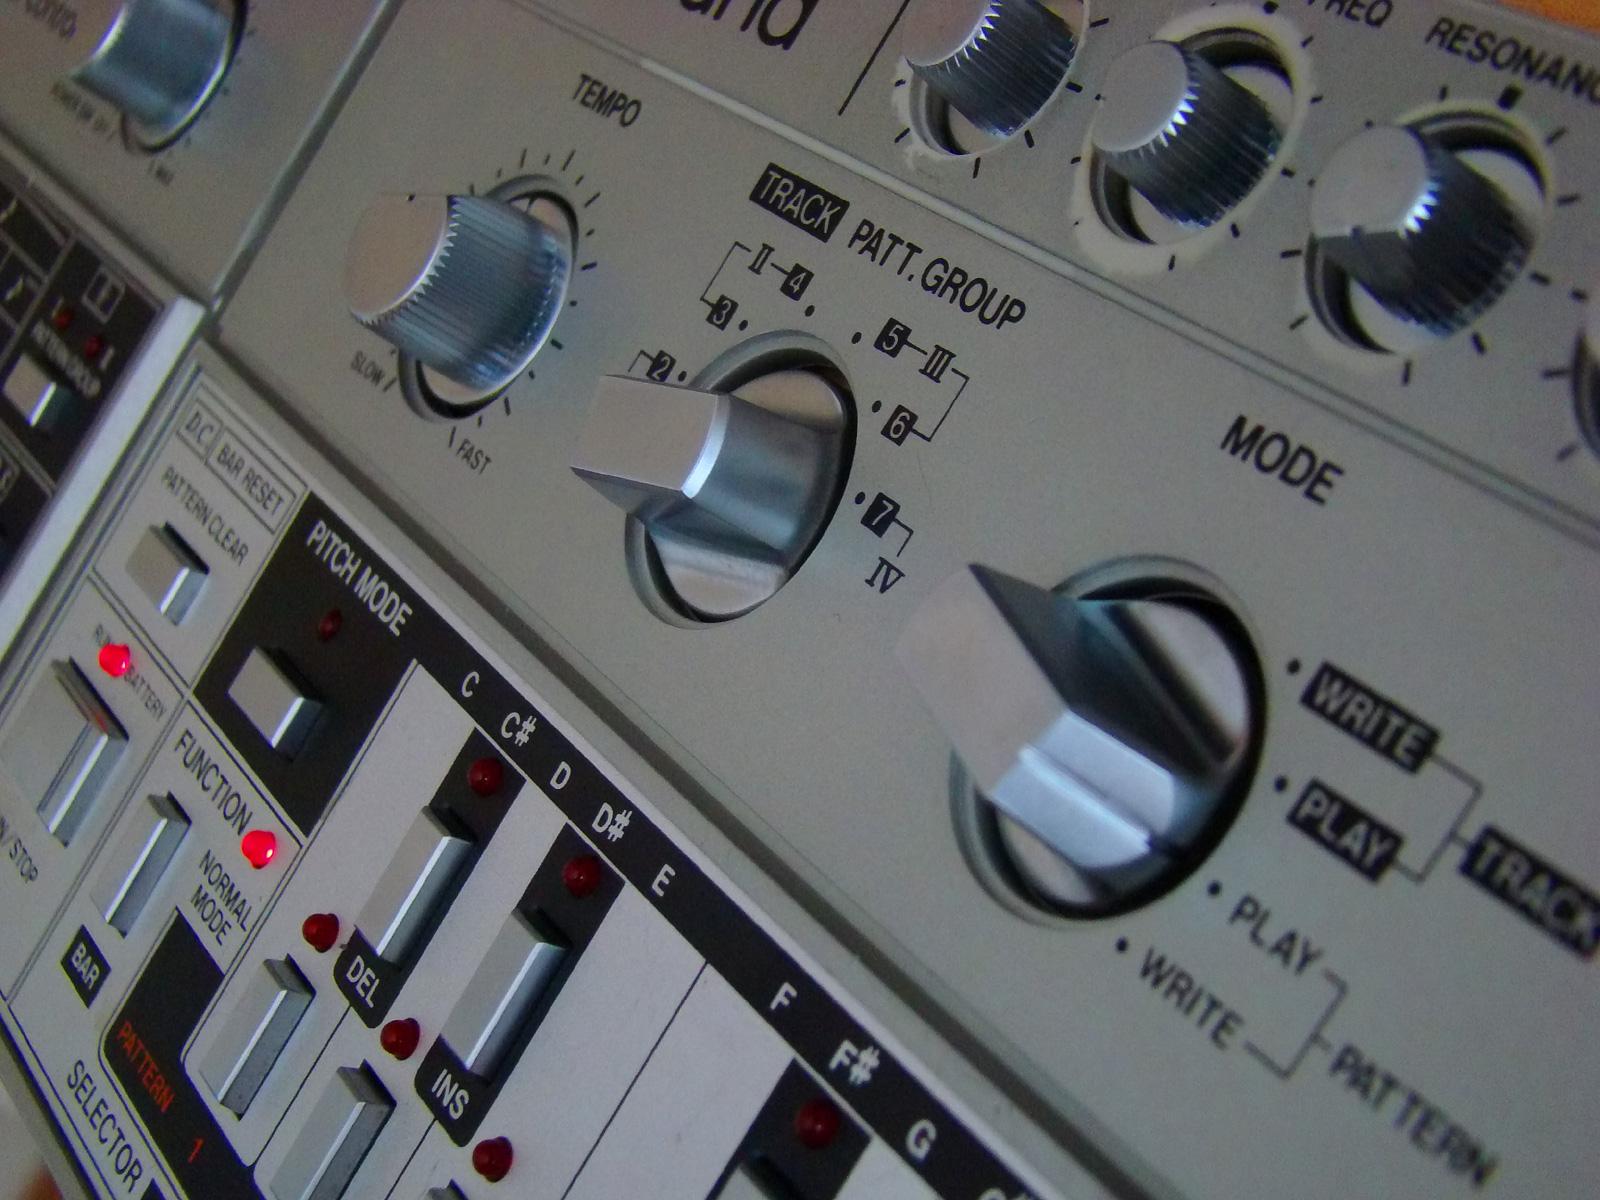 Tb303 closeup.jpg